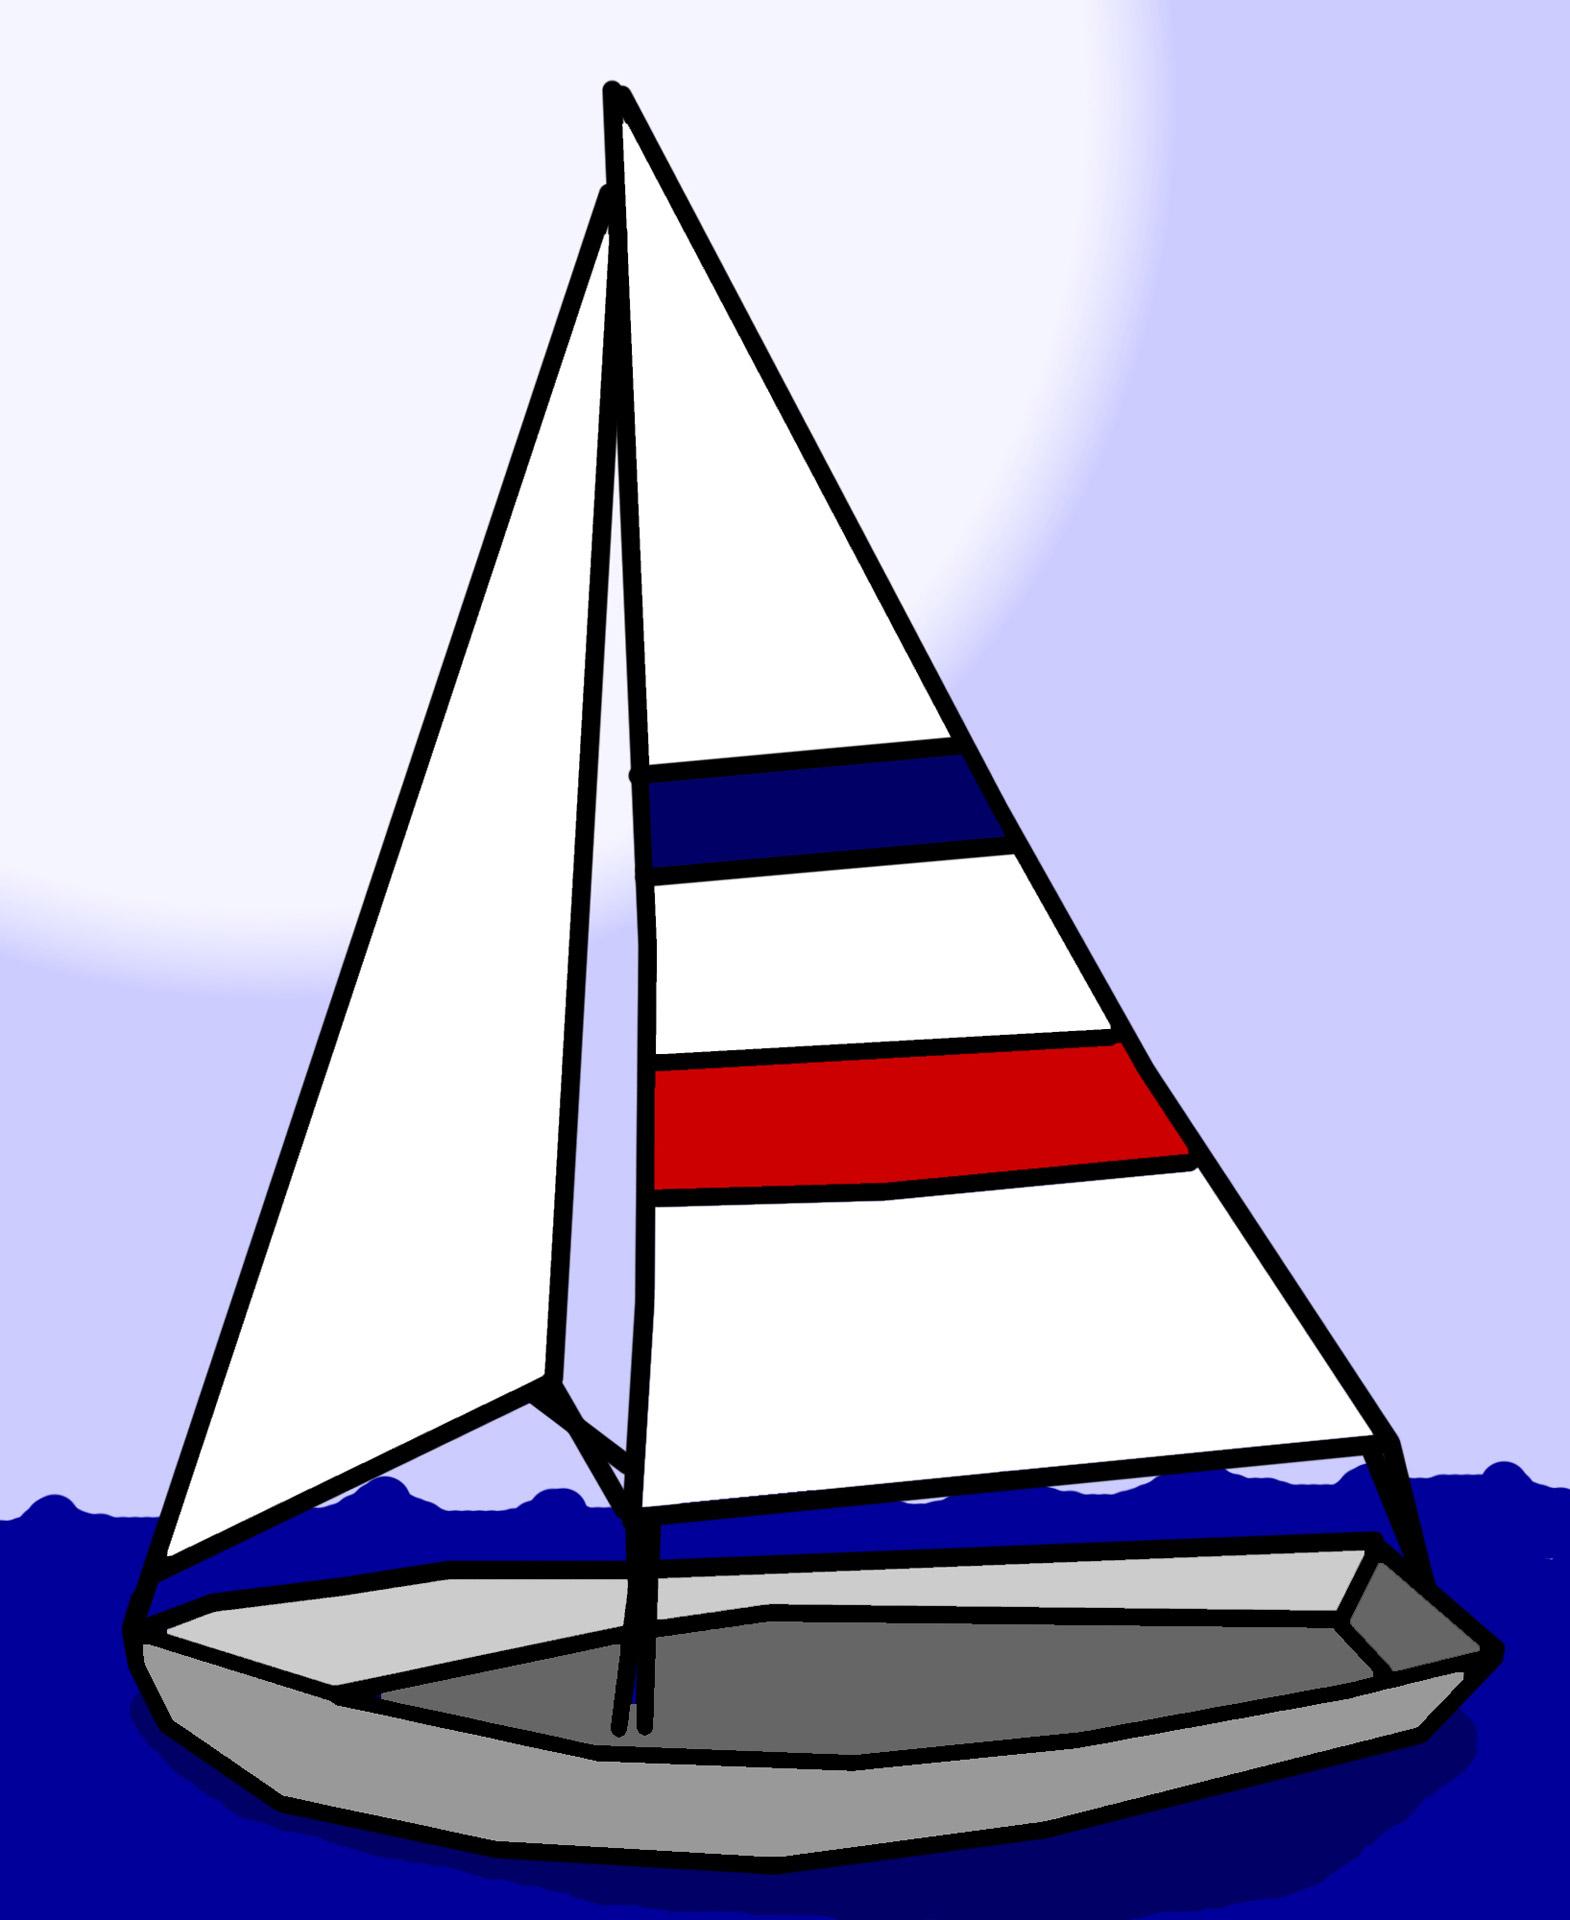 Sailboat Clip Art Free Stock Photo-Sailboat Clip Art Free Stock Photo-14